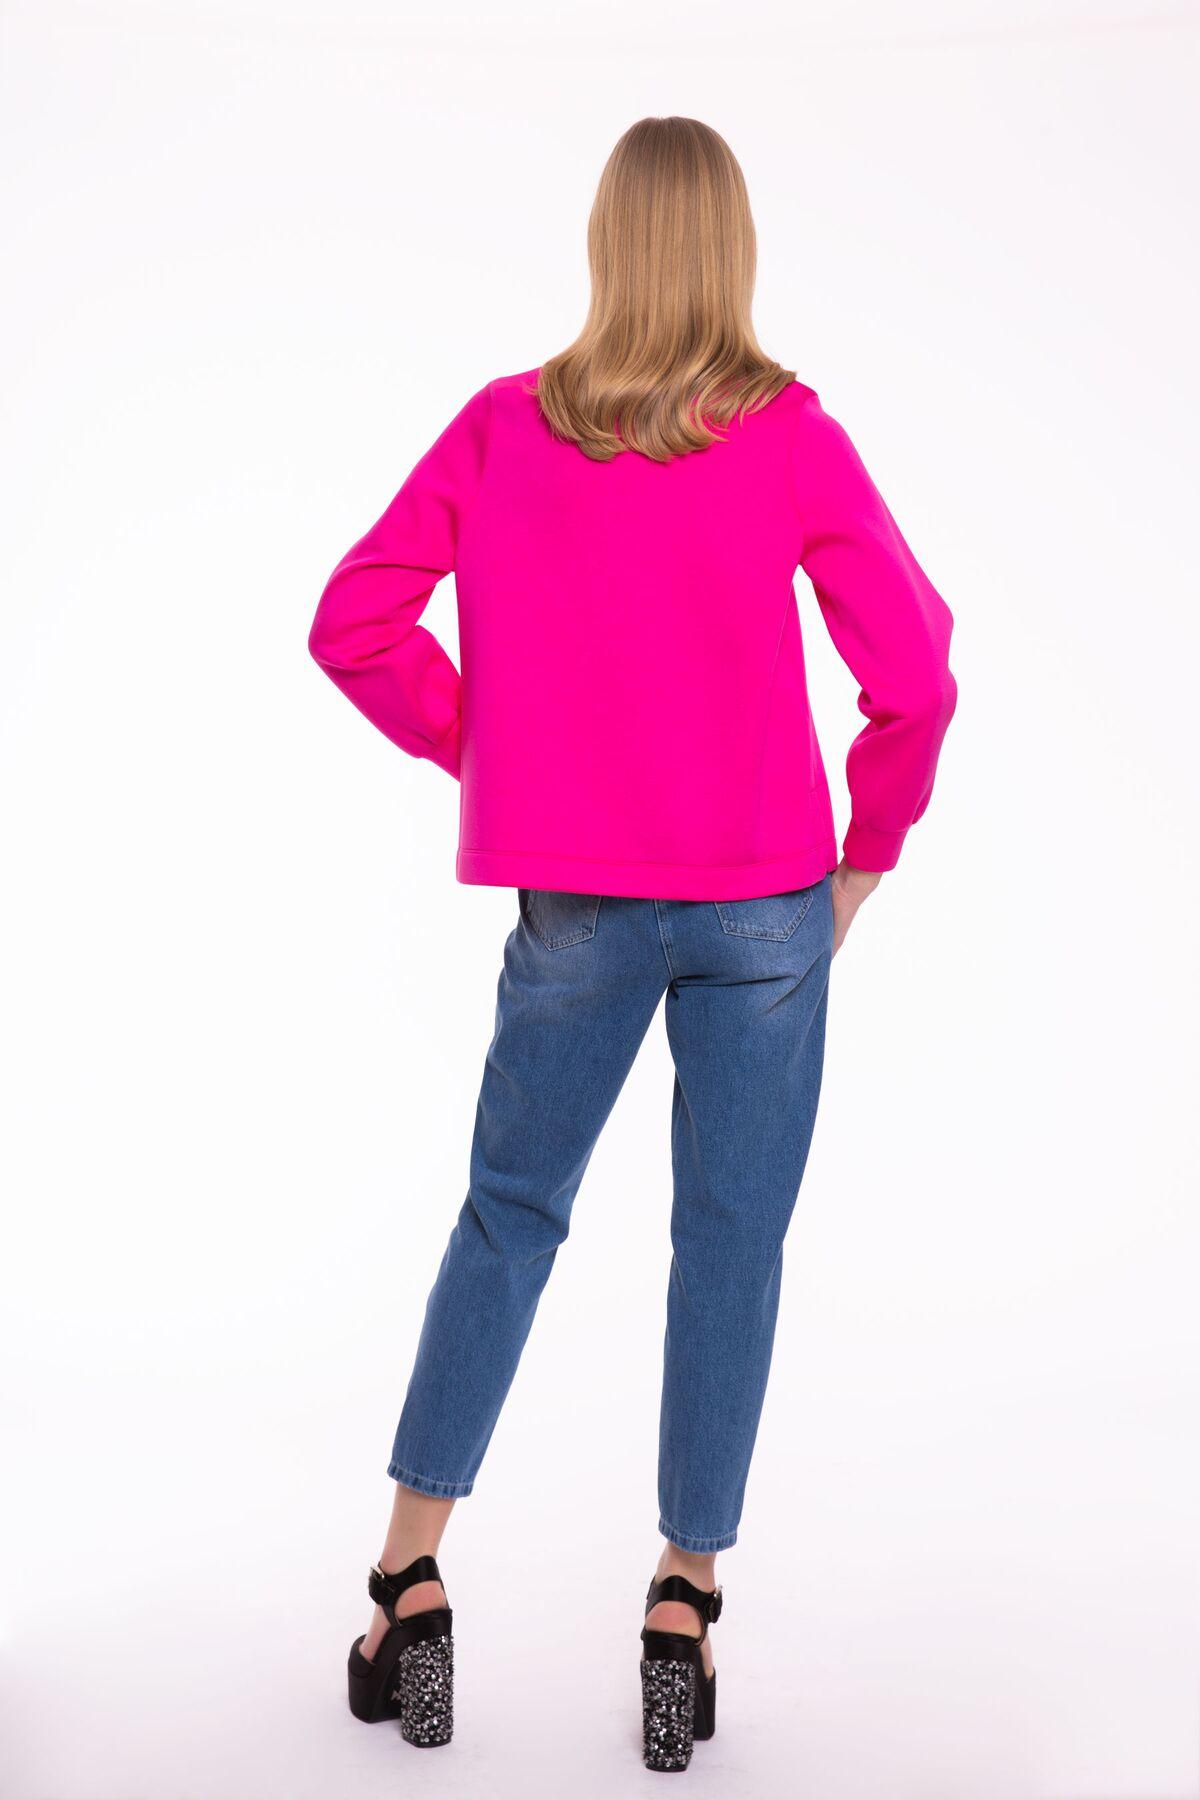 Taş İşlemeli Fuşya Sweatshirt